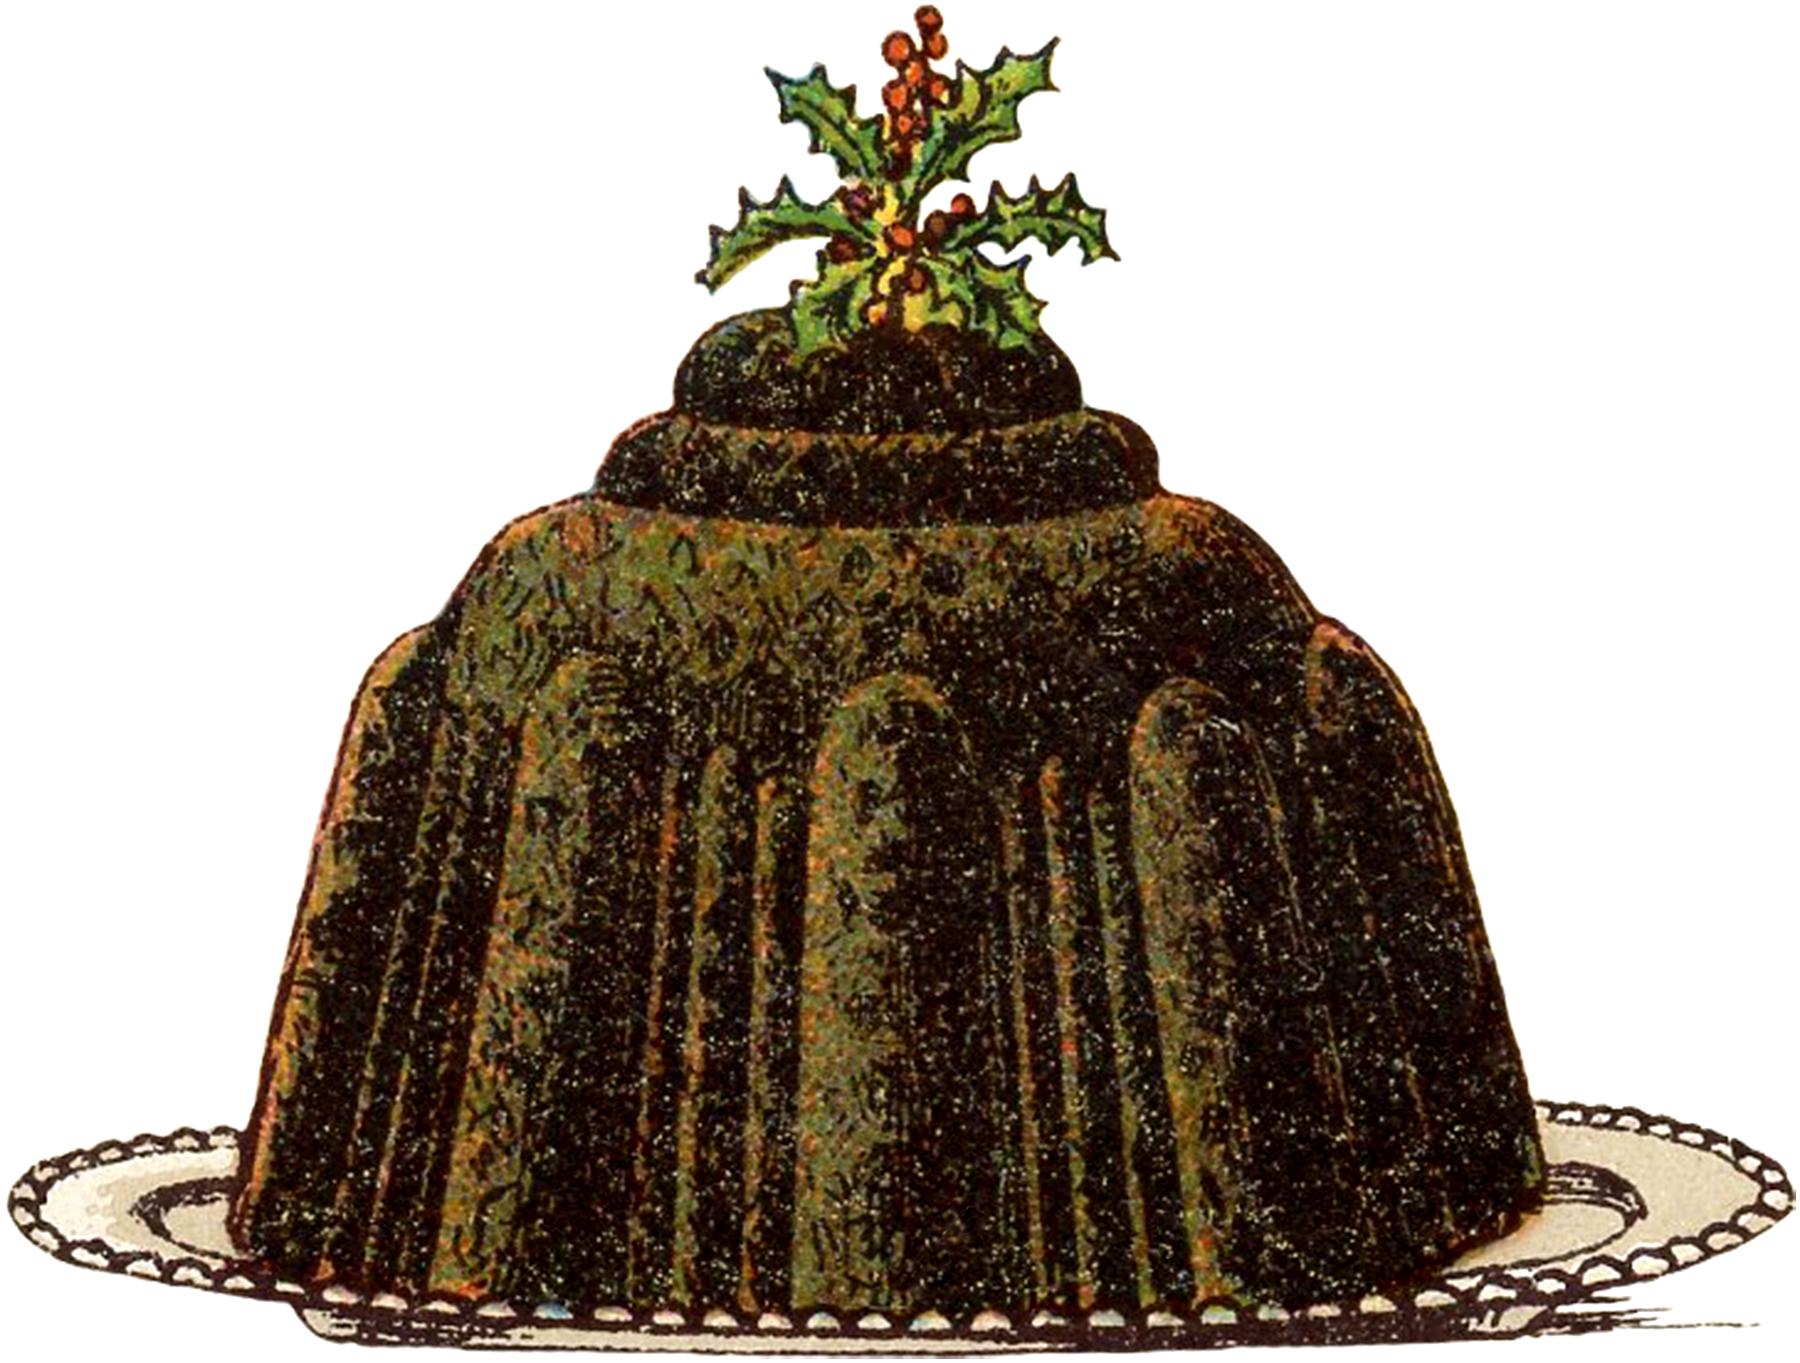 Vintage Christmas Plum Pudding Image The Graphics Fairy